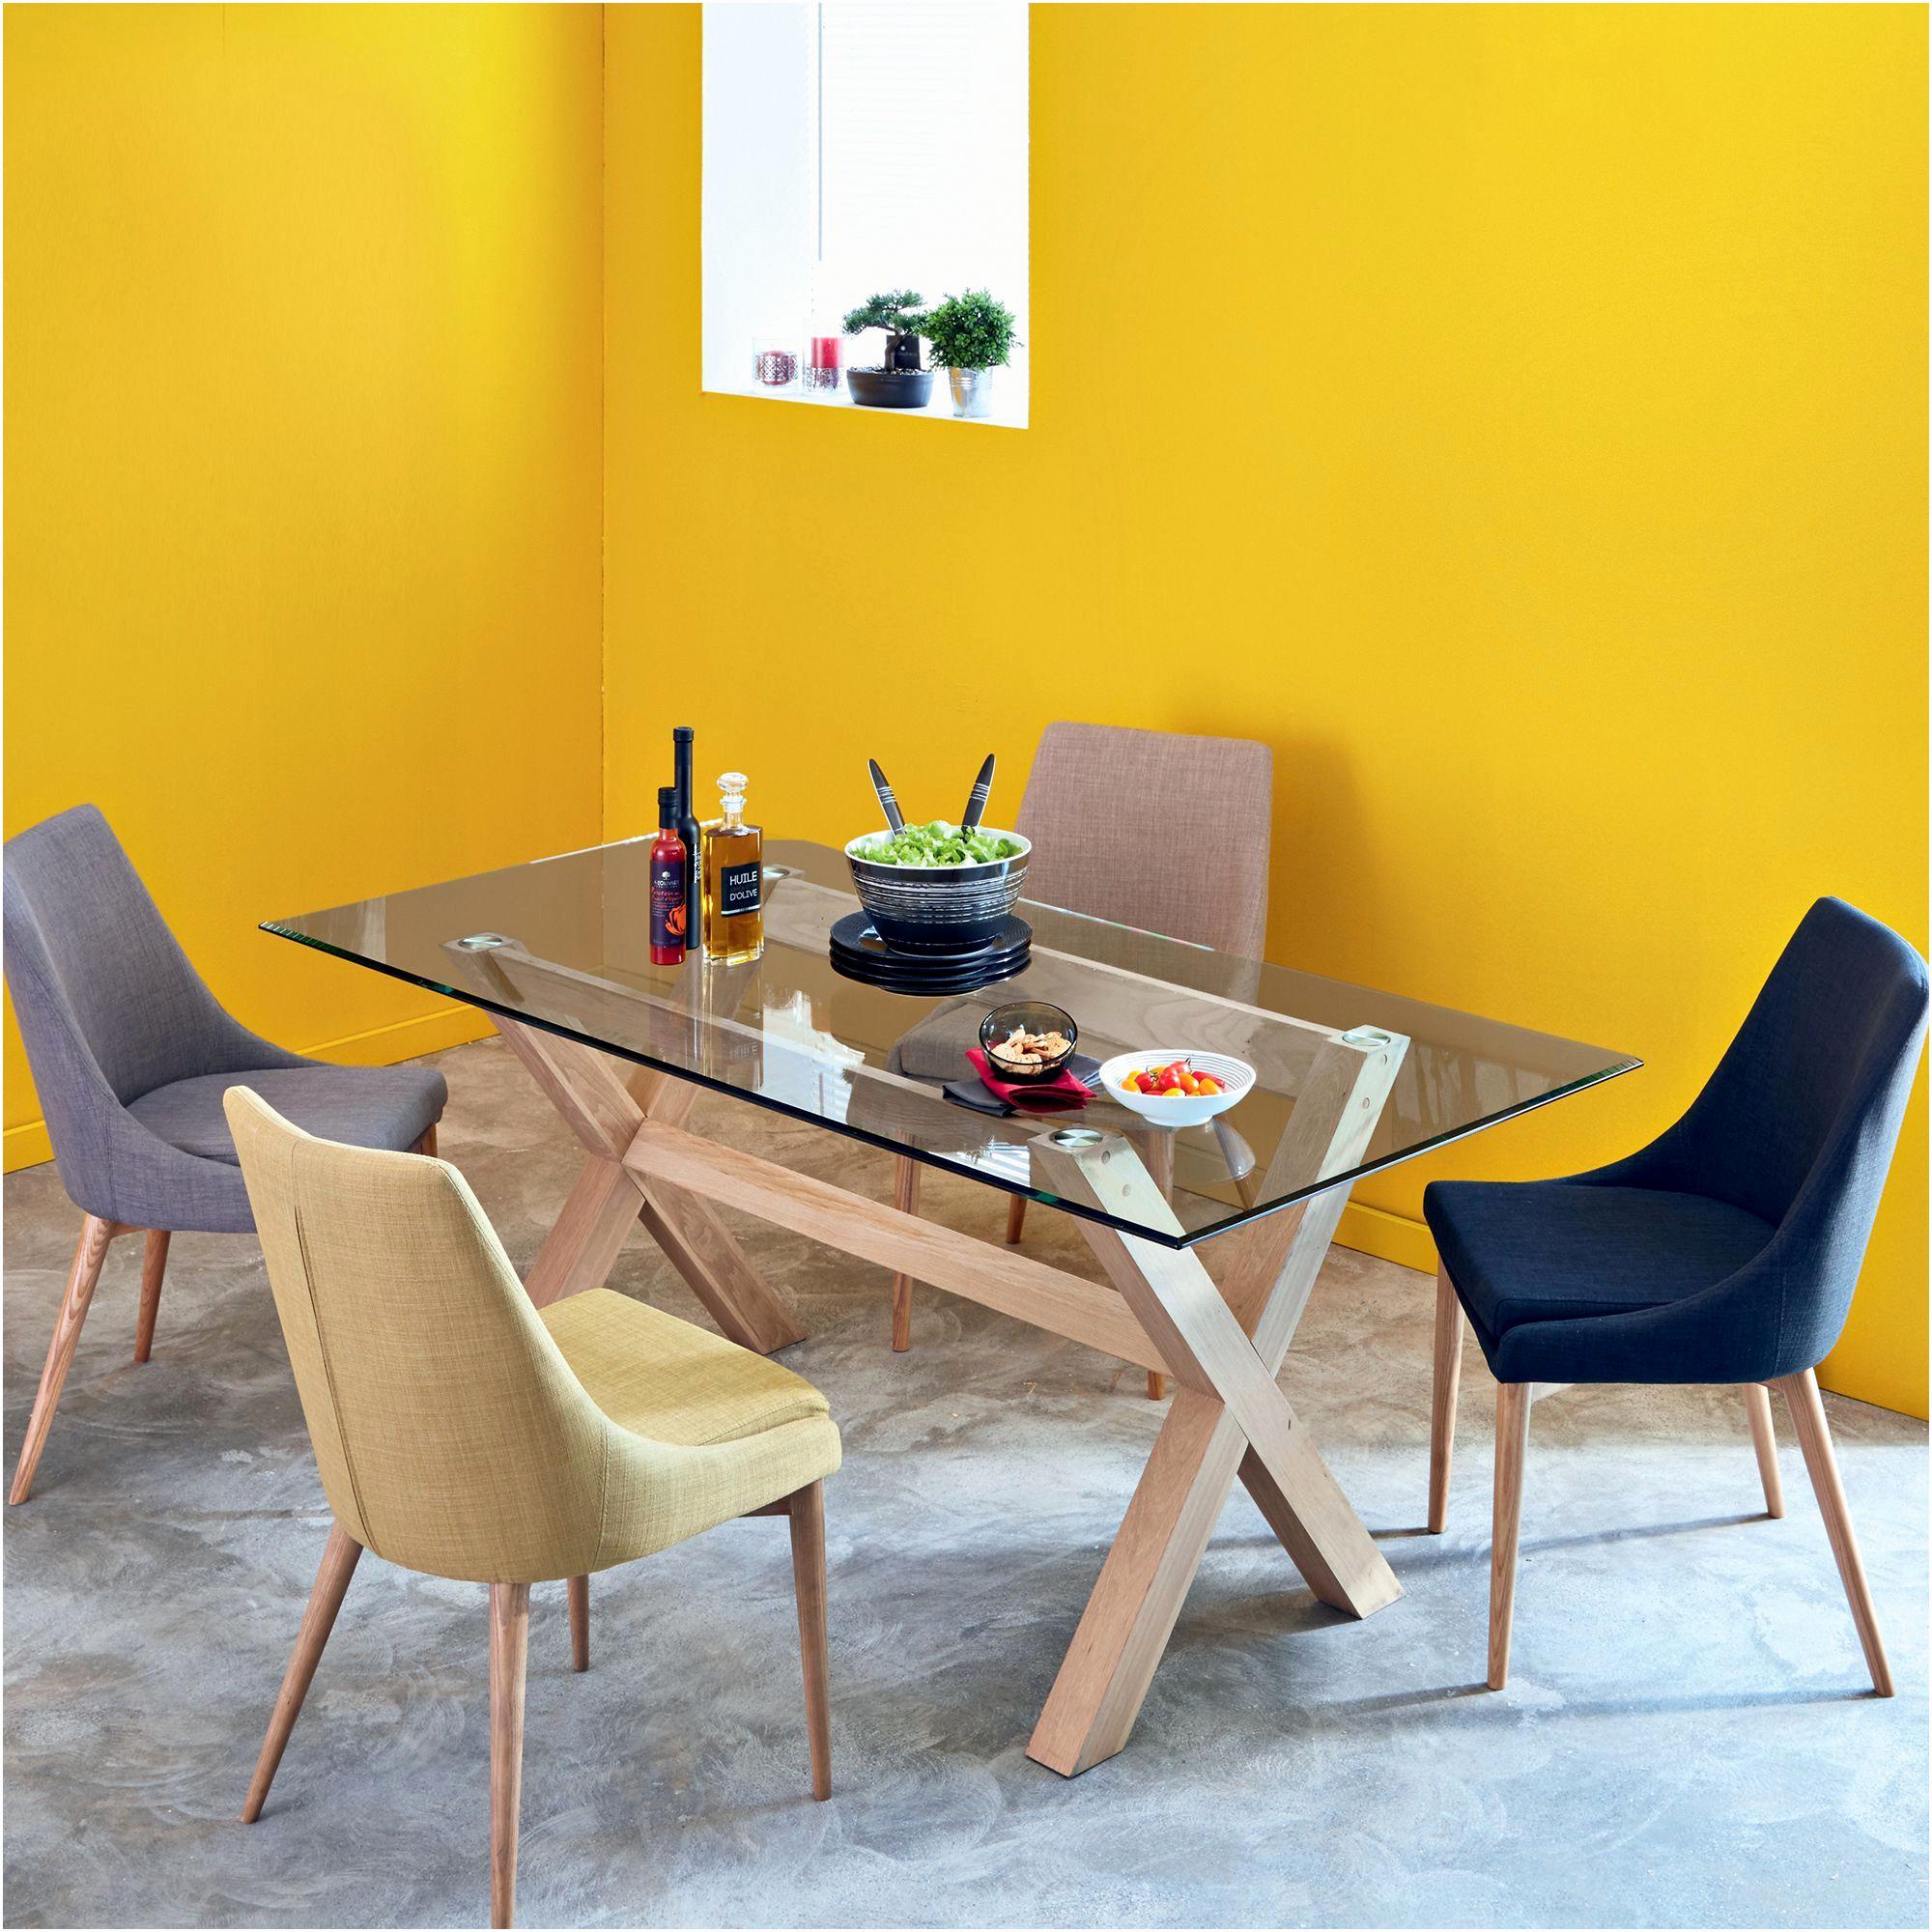 chaise salle a manger scandinave elegant decent table a manger scandinave e280a2 decorationdetable of chaise salle a manger scandinave